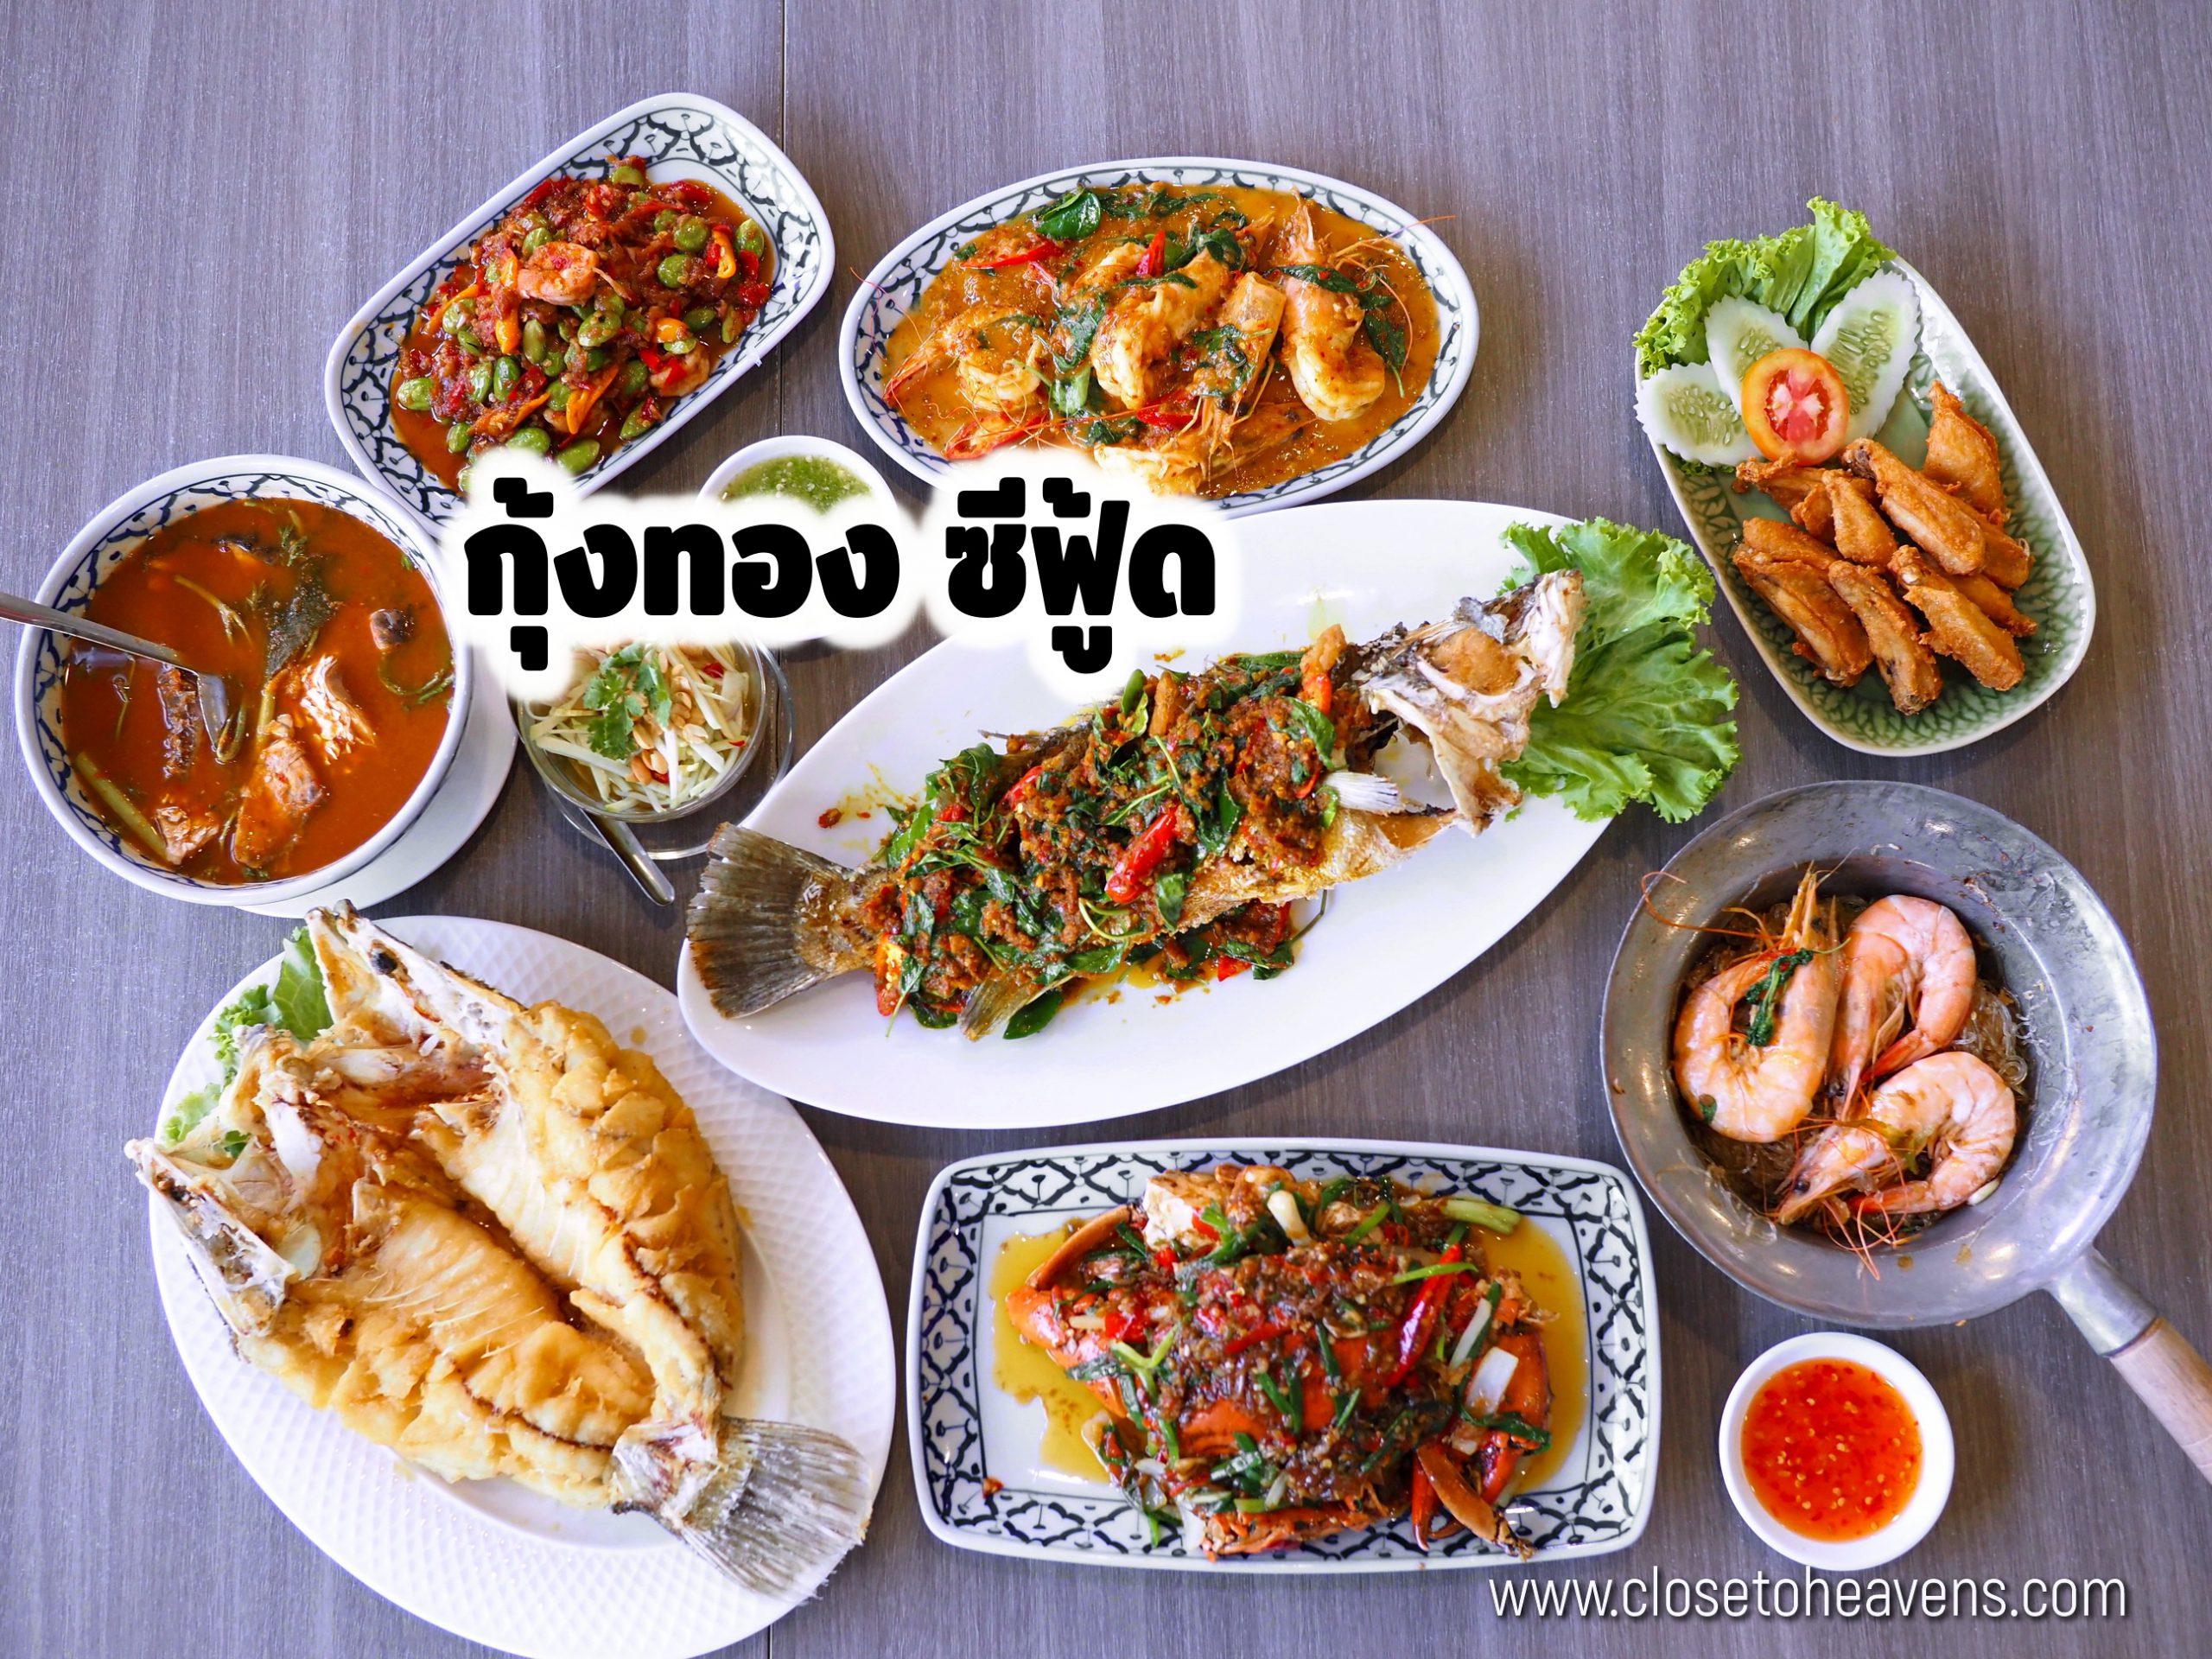 Kungthong Seafood กุ้งทอง ซีฟู้ด พระราม 4